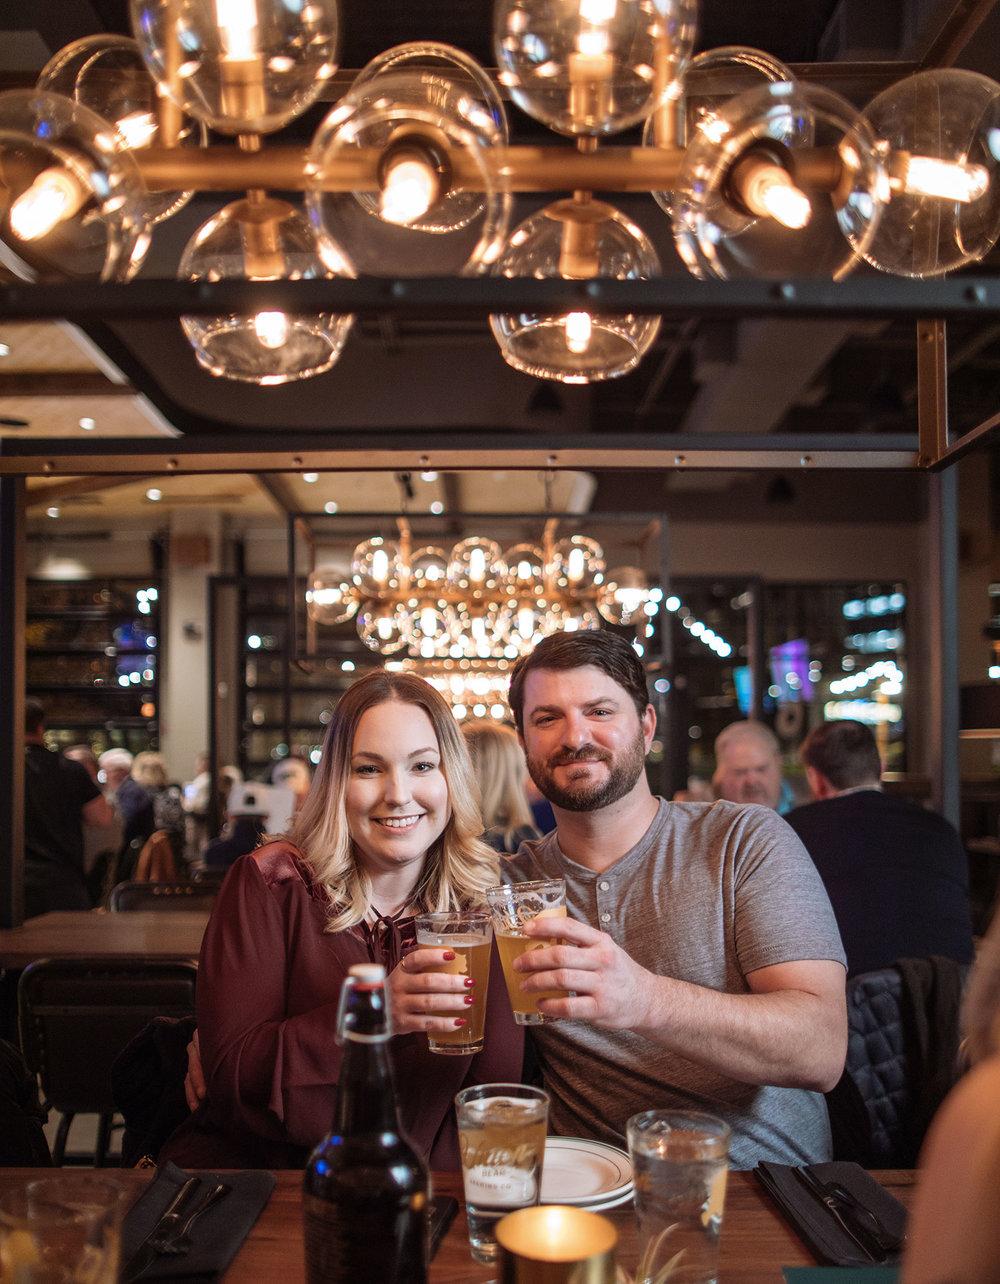 Union-Bear-Brewing-Restaurant-Pub-Plano-Magazine-13-Kathy-Tran.jpg